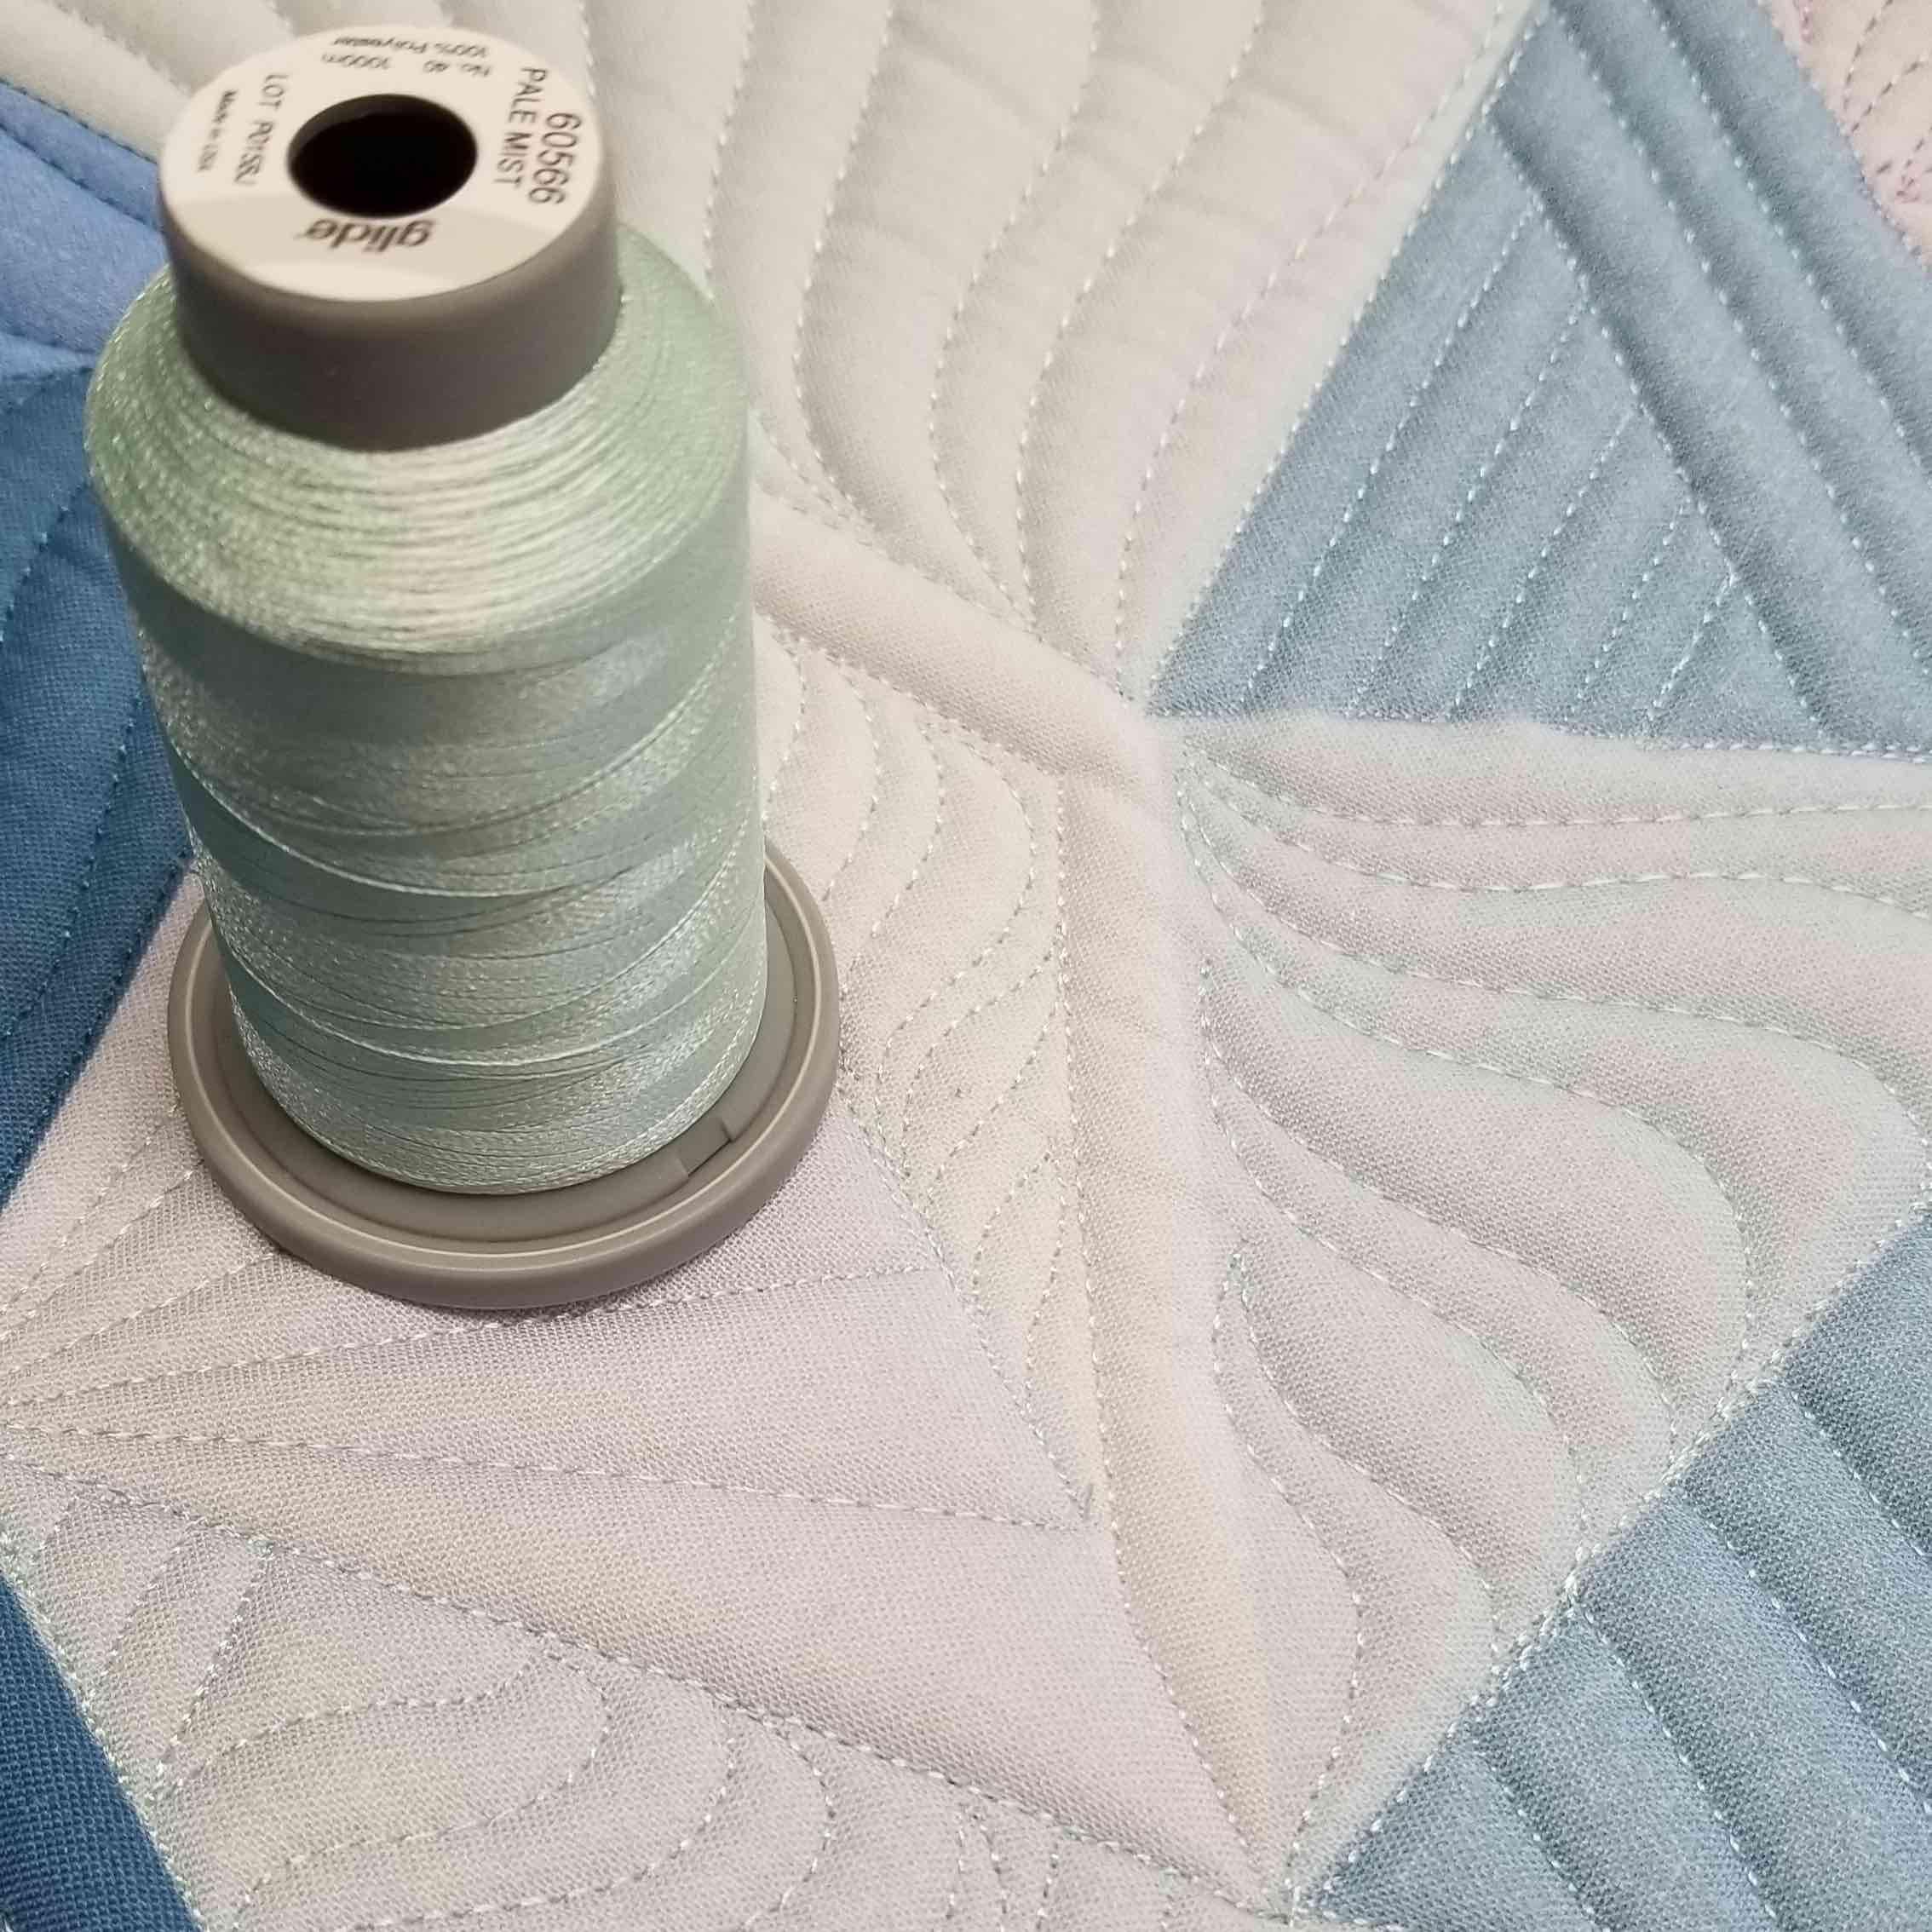 pale mist glide poly thread 40 wt